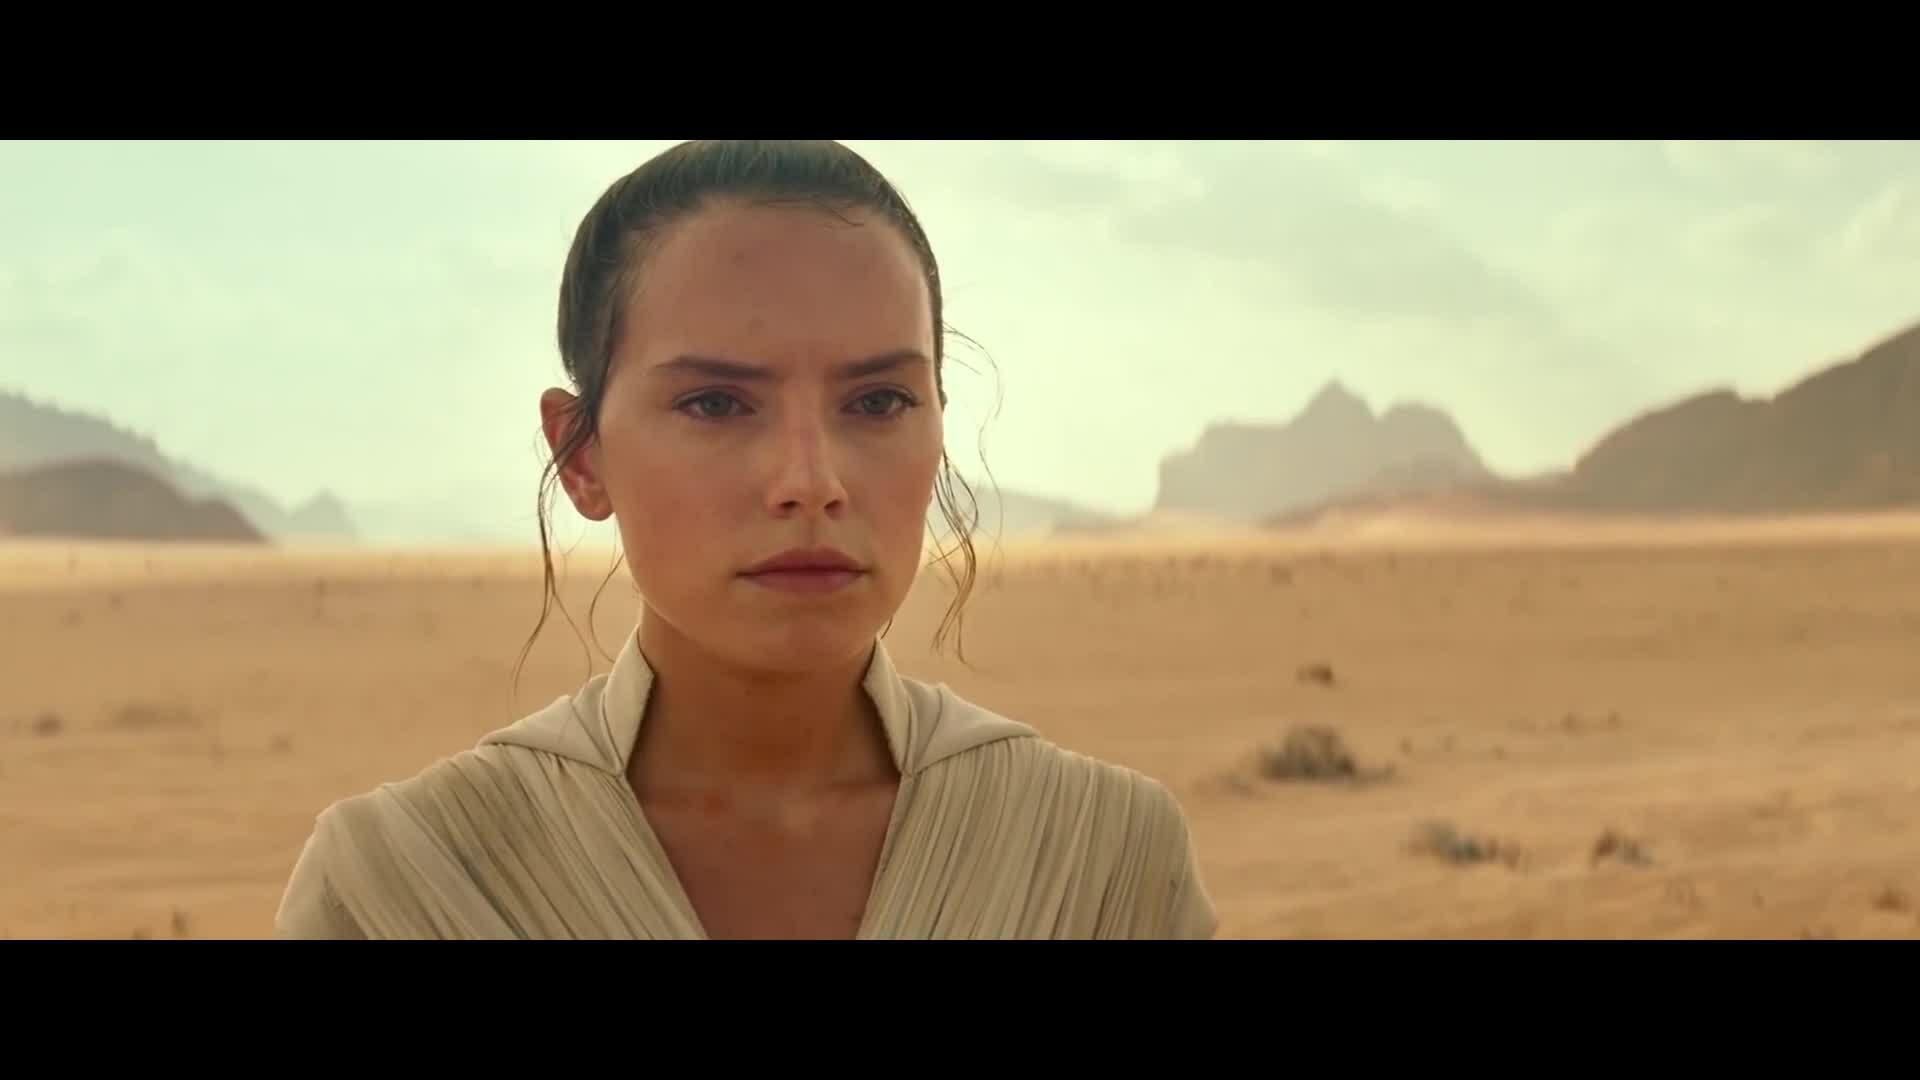 Trailer Star Wars Episode IX- The Rise Of Skywalker